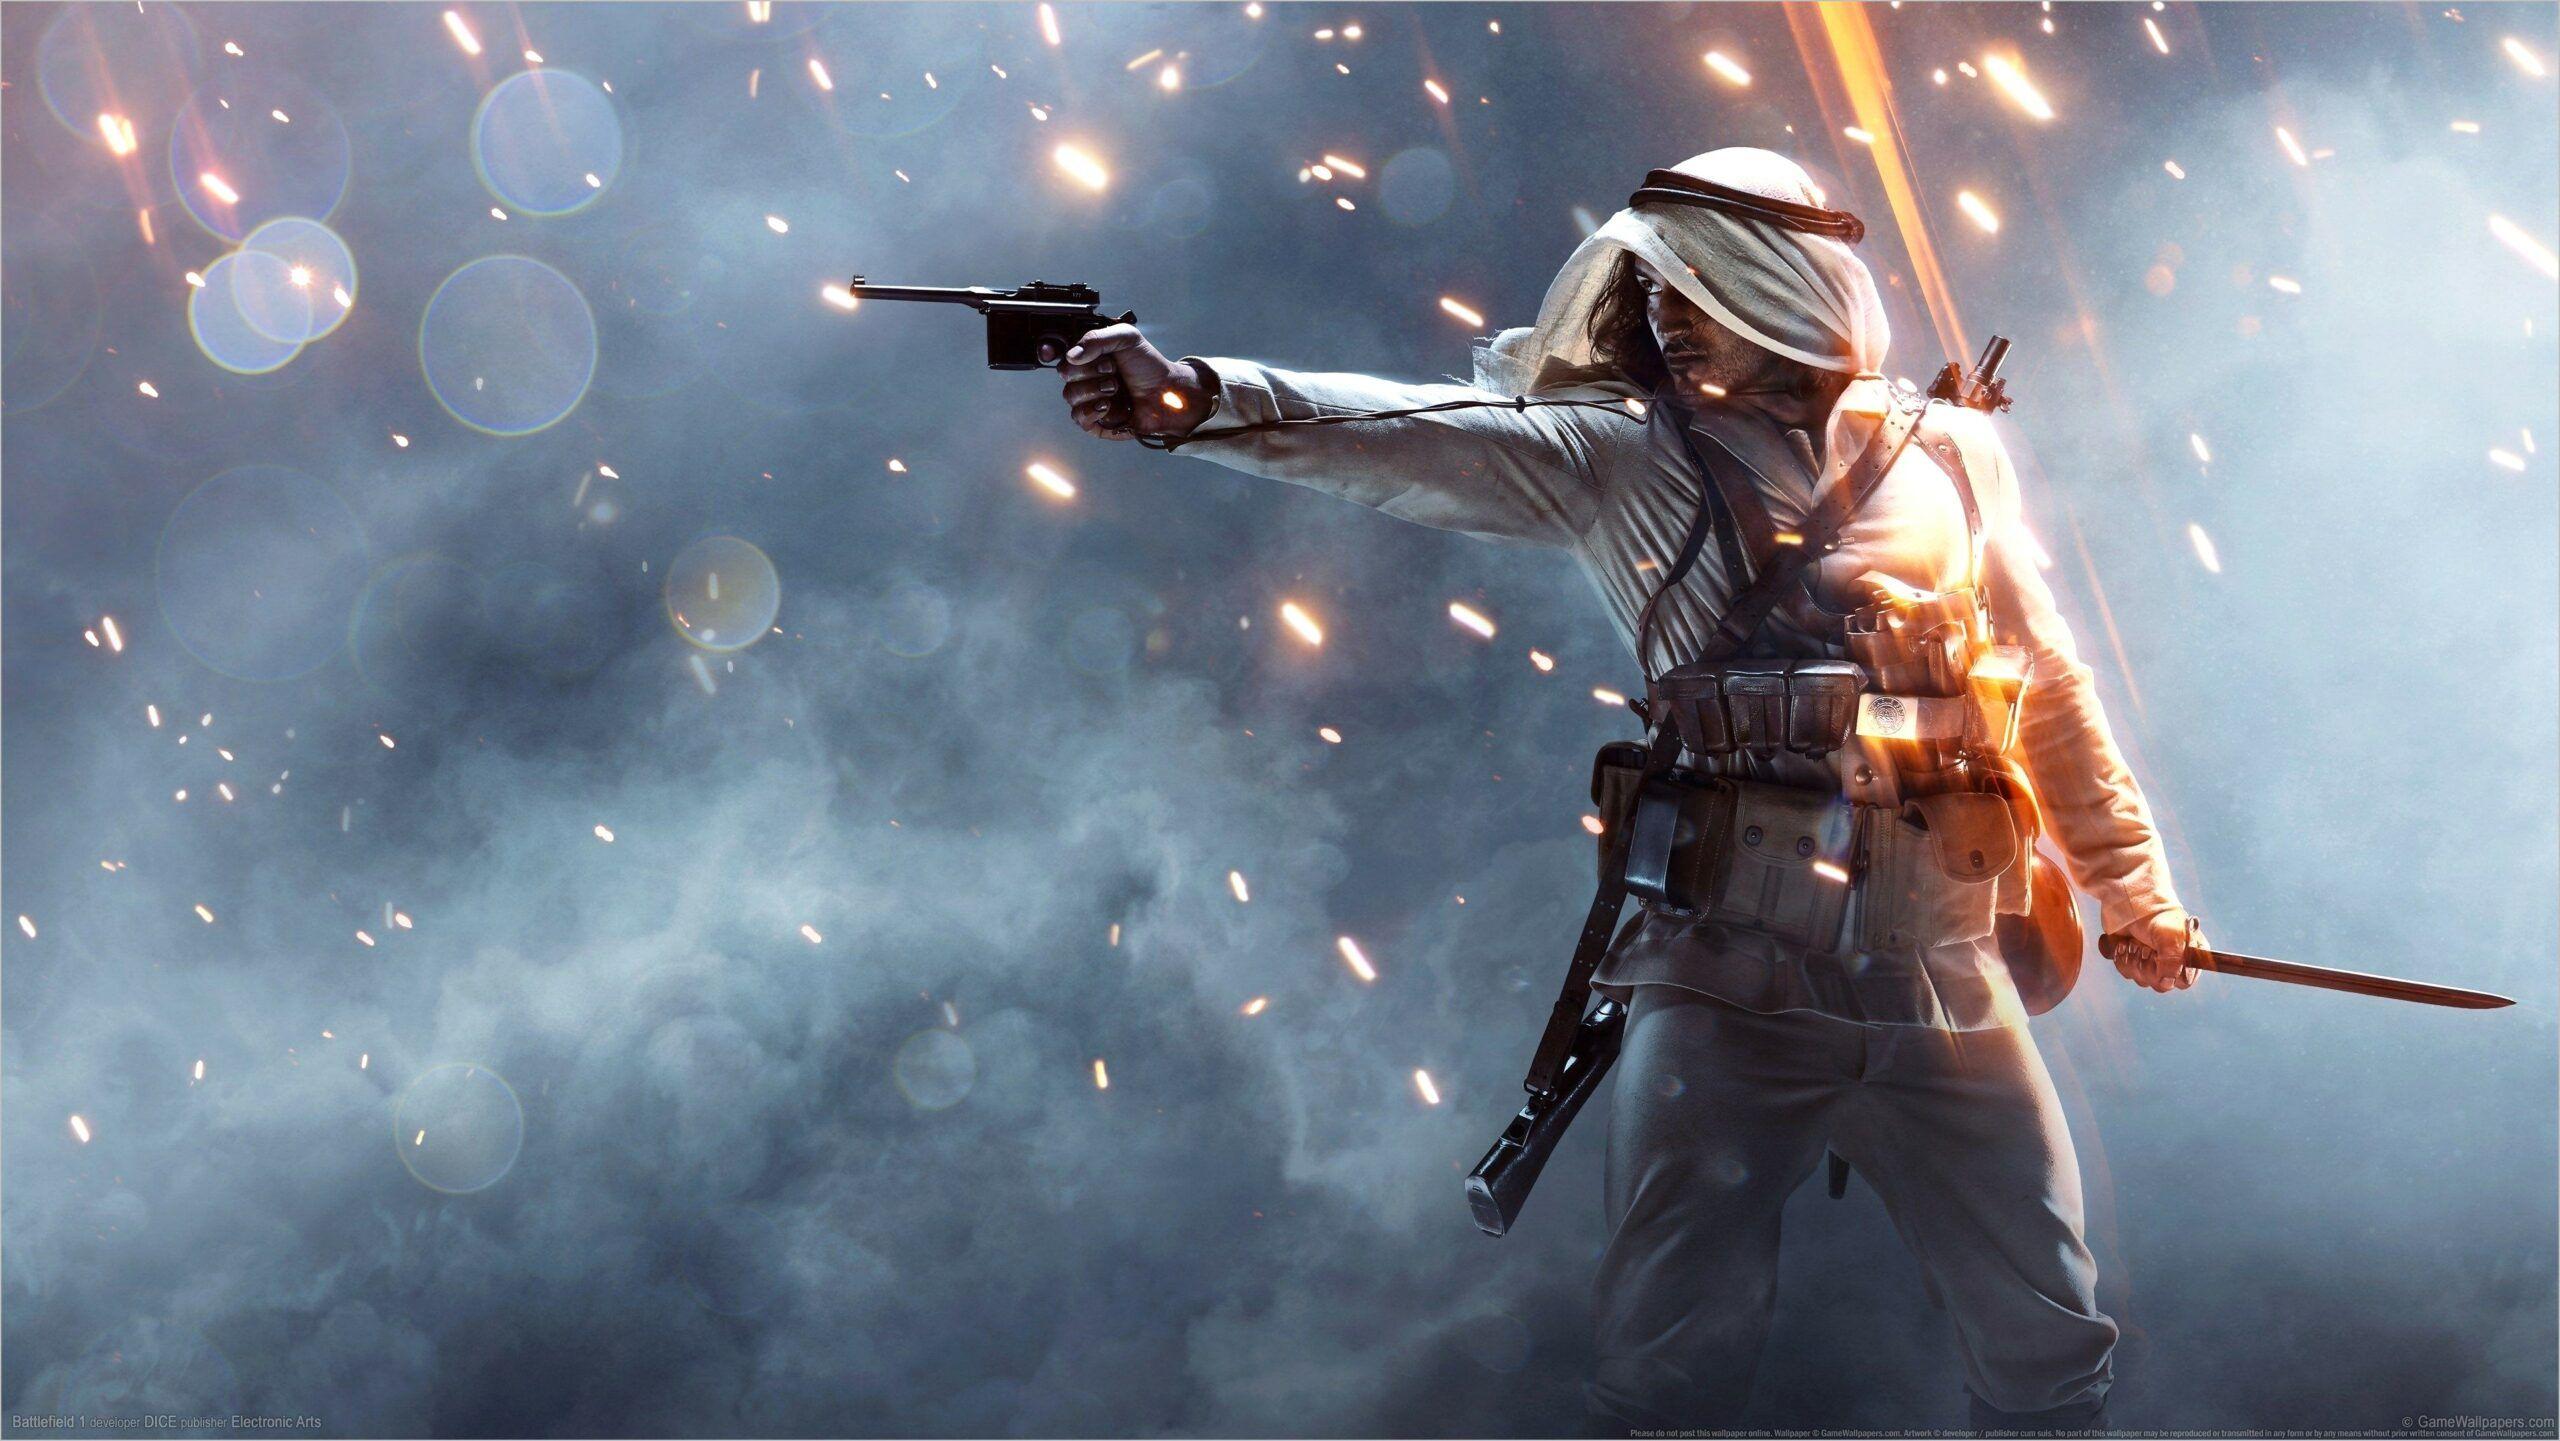 Battlfeidl 5 4k Wallpapers In 2020 Battlefield 1 Battlefield Gaming Wallpapers